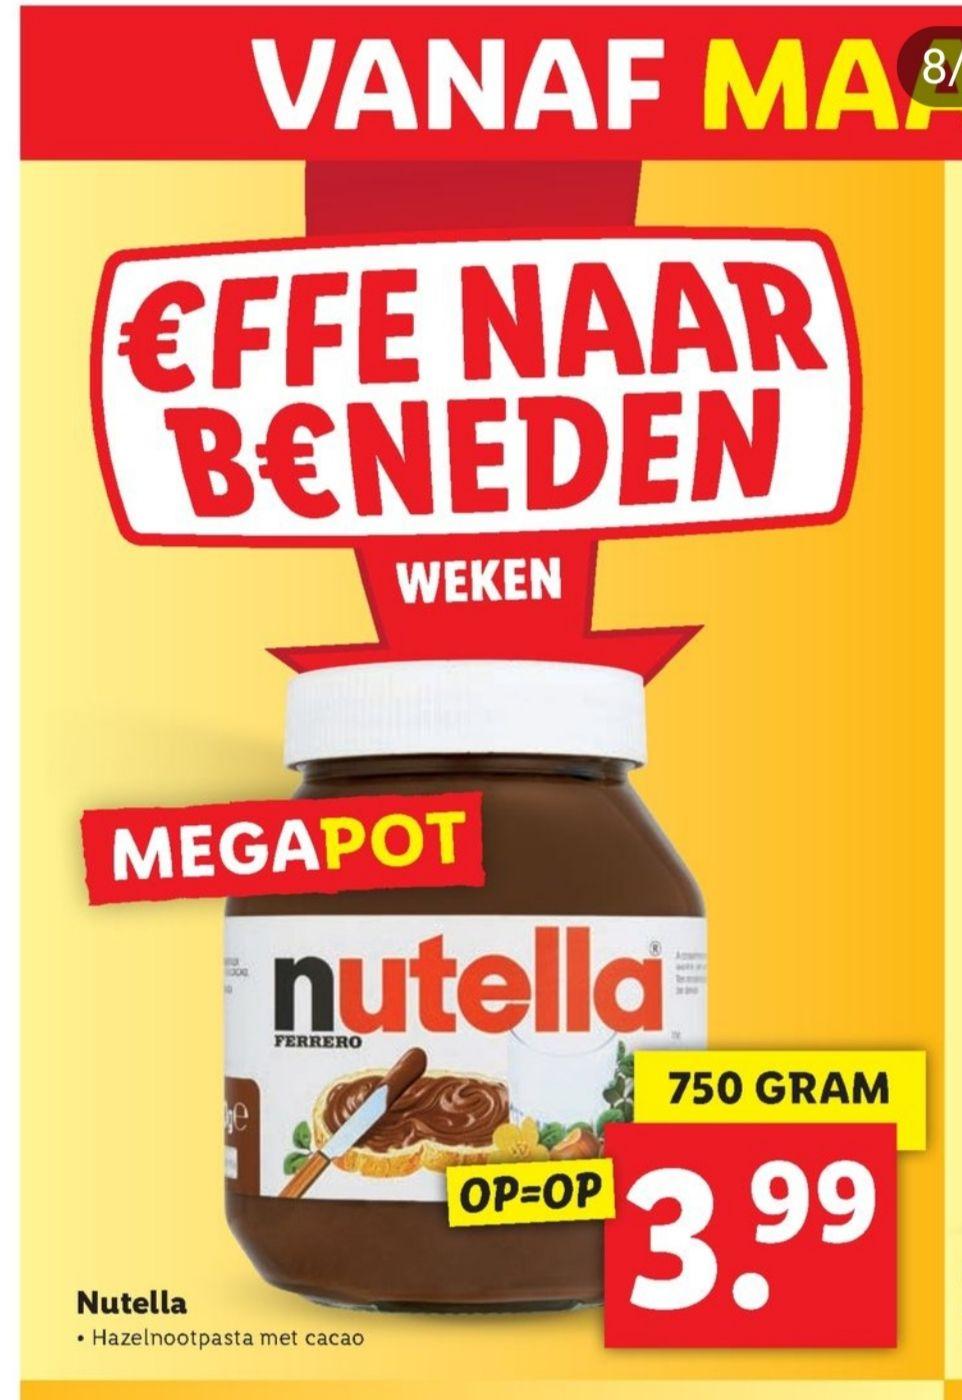 750 gram pot Nutella @Lidl